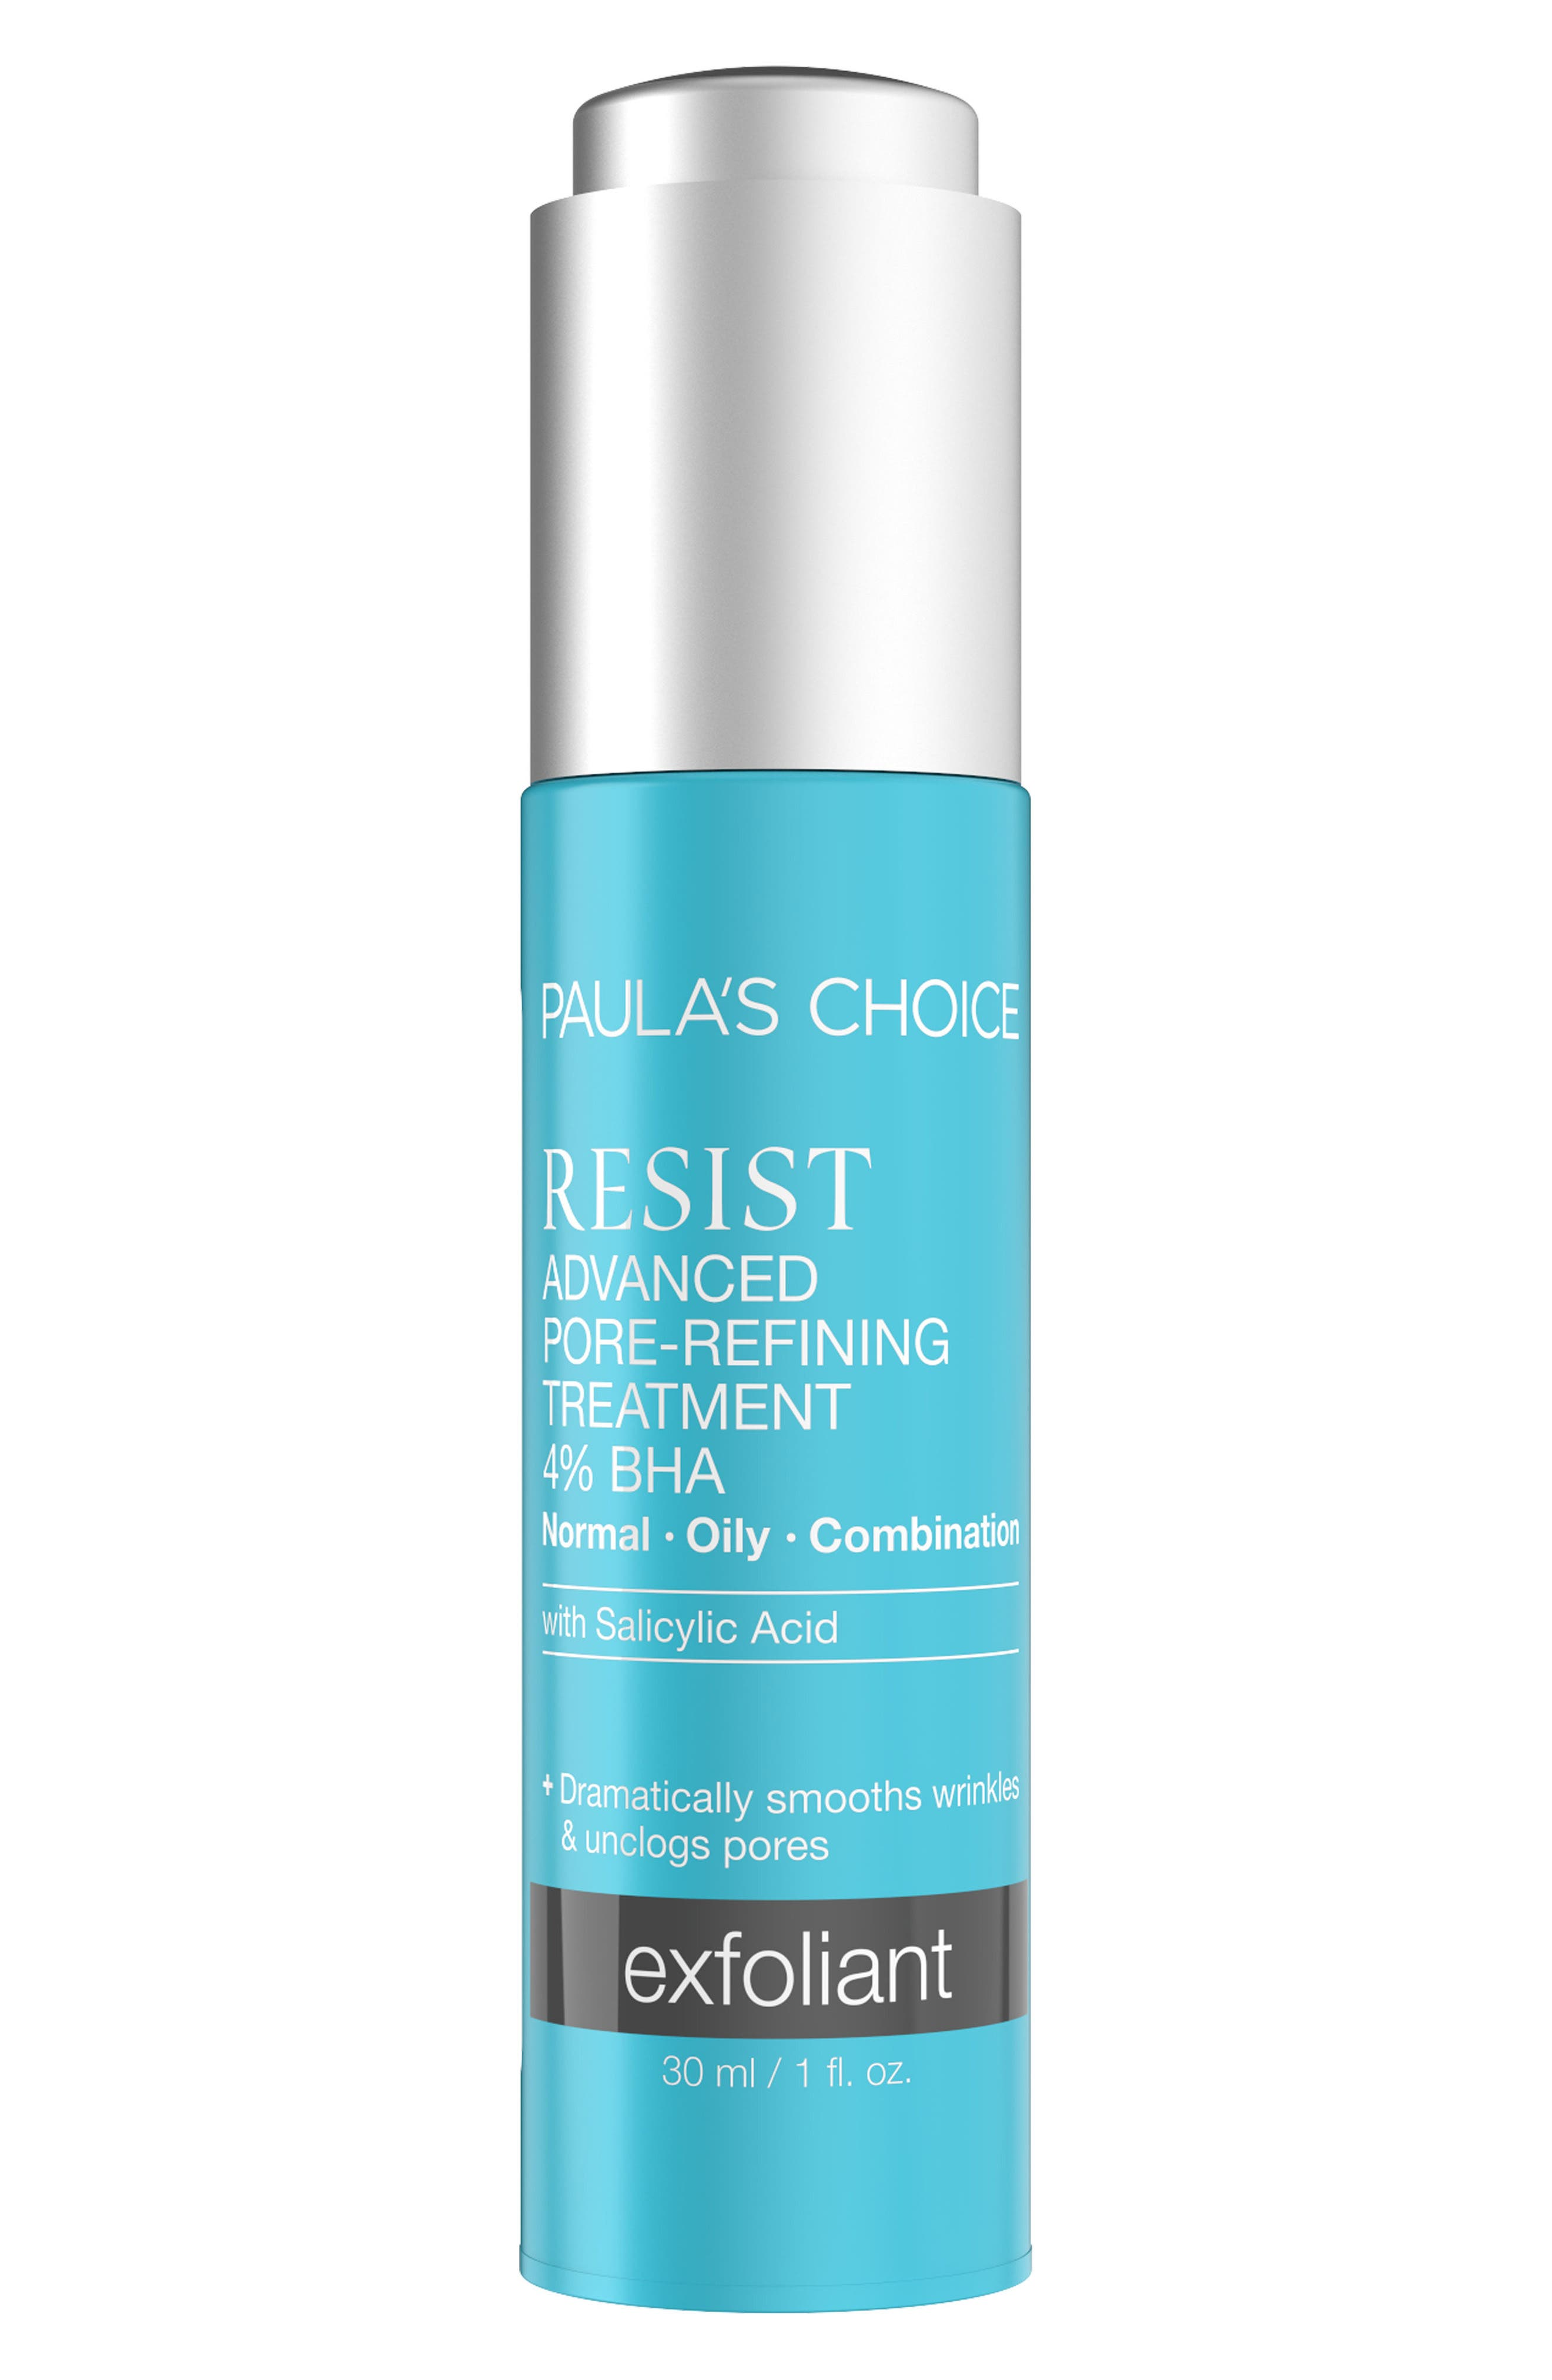 Paula's Choice Resist Advanced Pore Refining Treatment 4% BHA